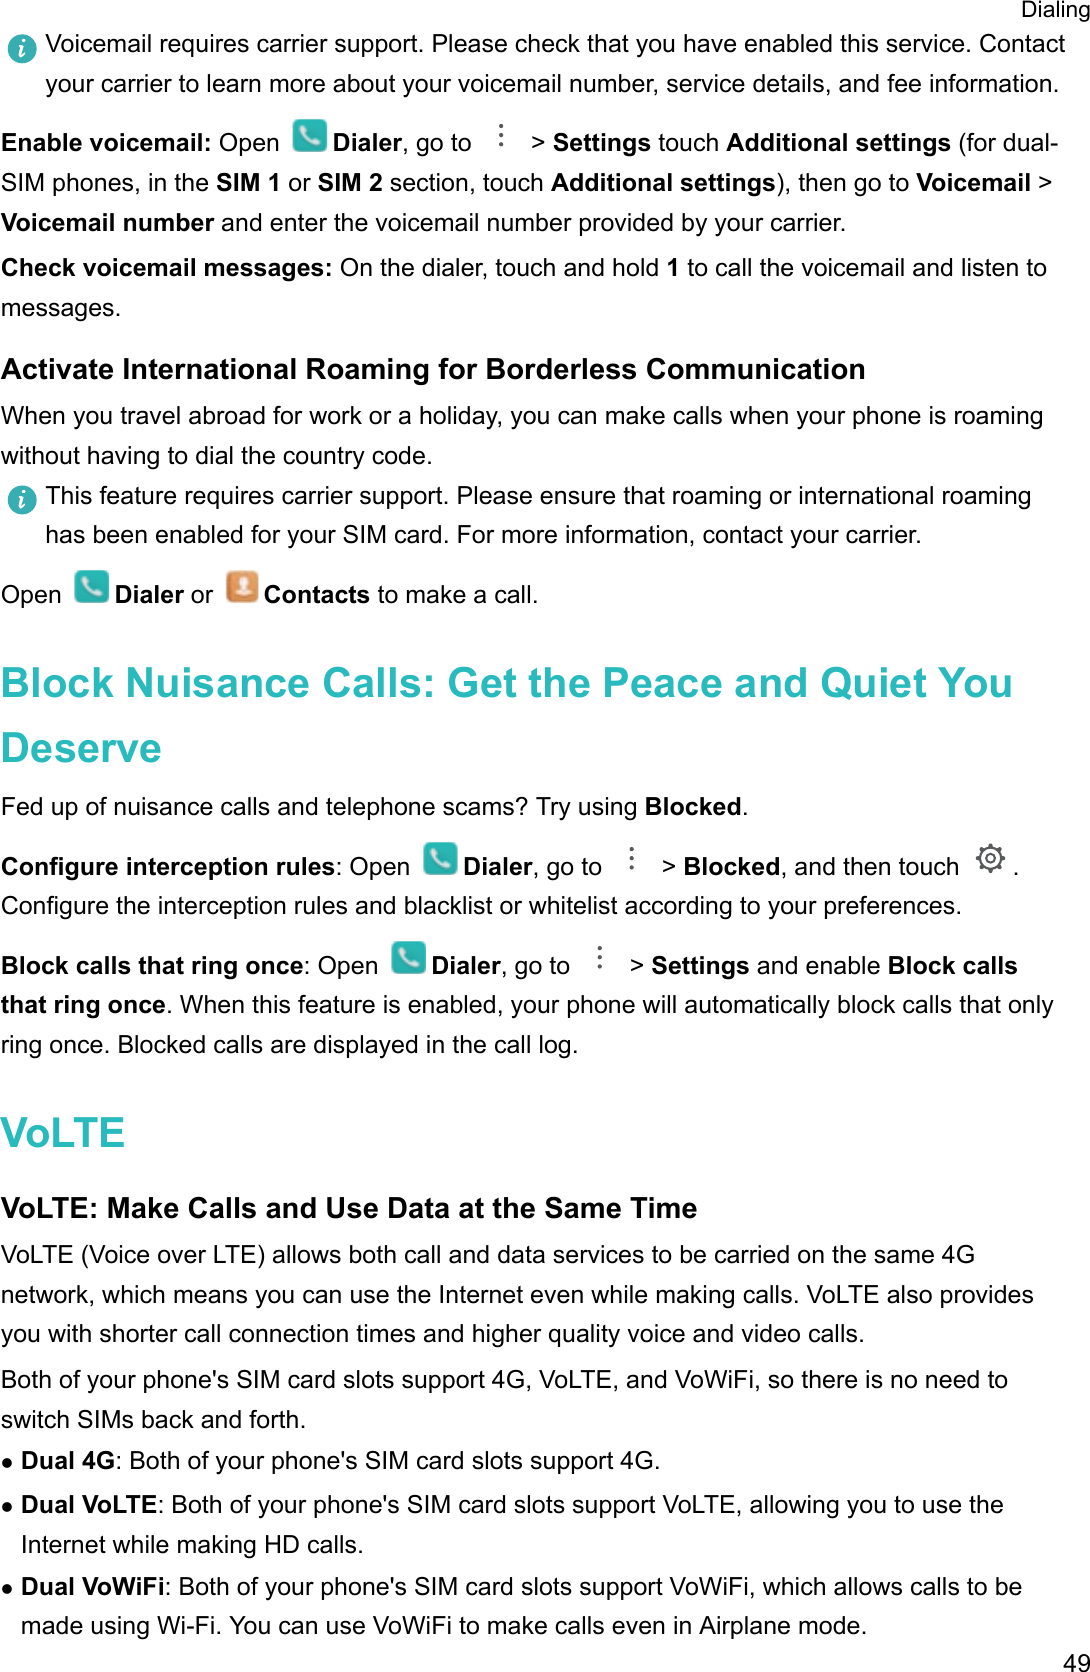 Huawei Mate 10 Pro User Guide (BLA L09&L29 01,EN,Normal)